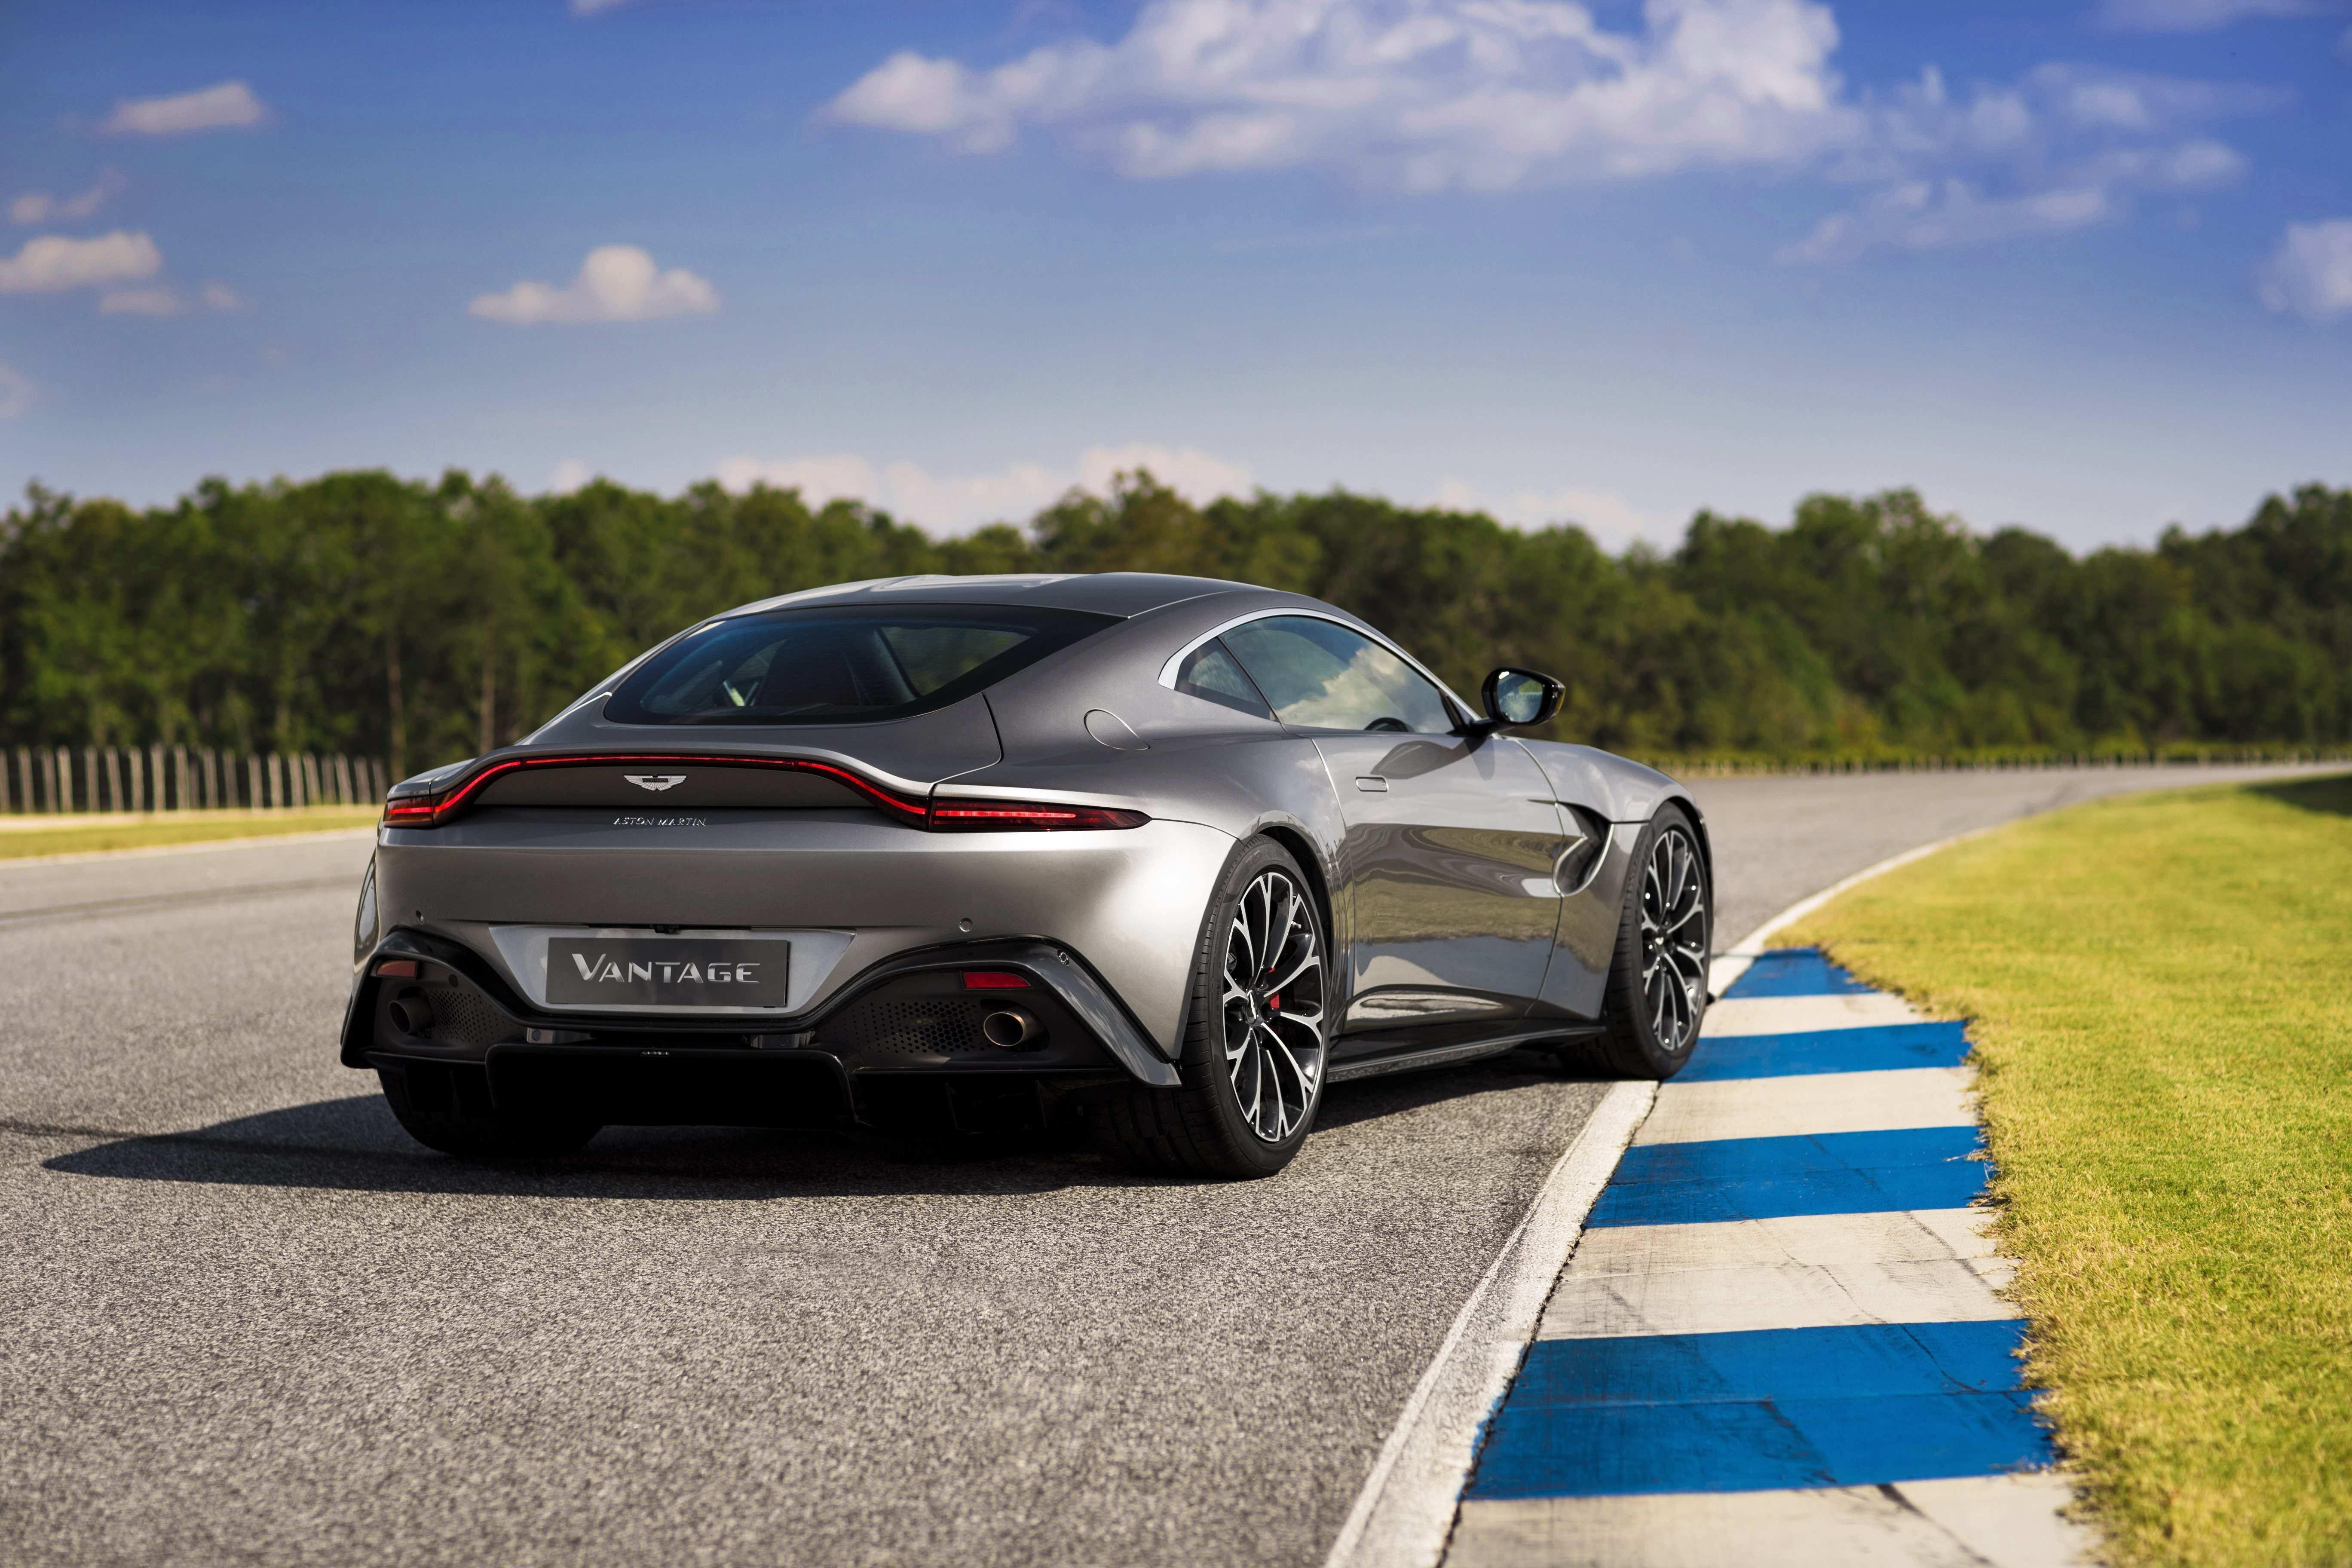 37 Gallery of 2019 Aston Martin Rapide Interior for 2019 Aston Martin Rapide